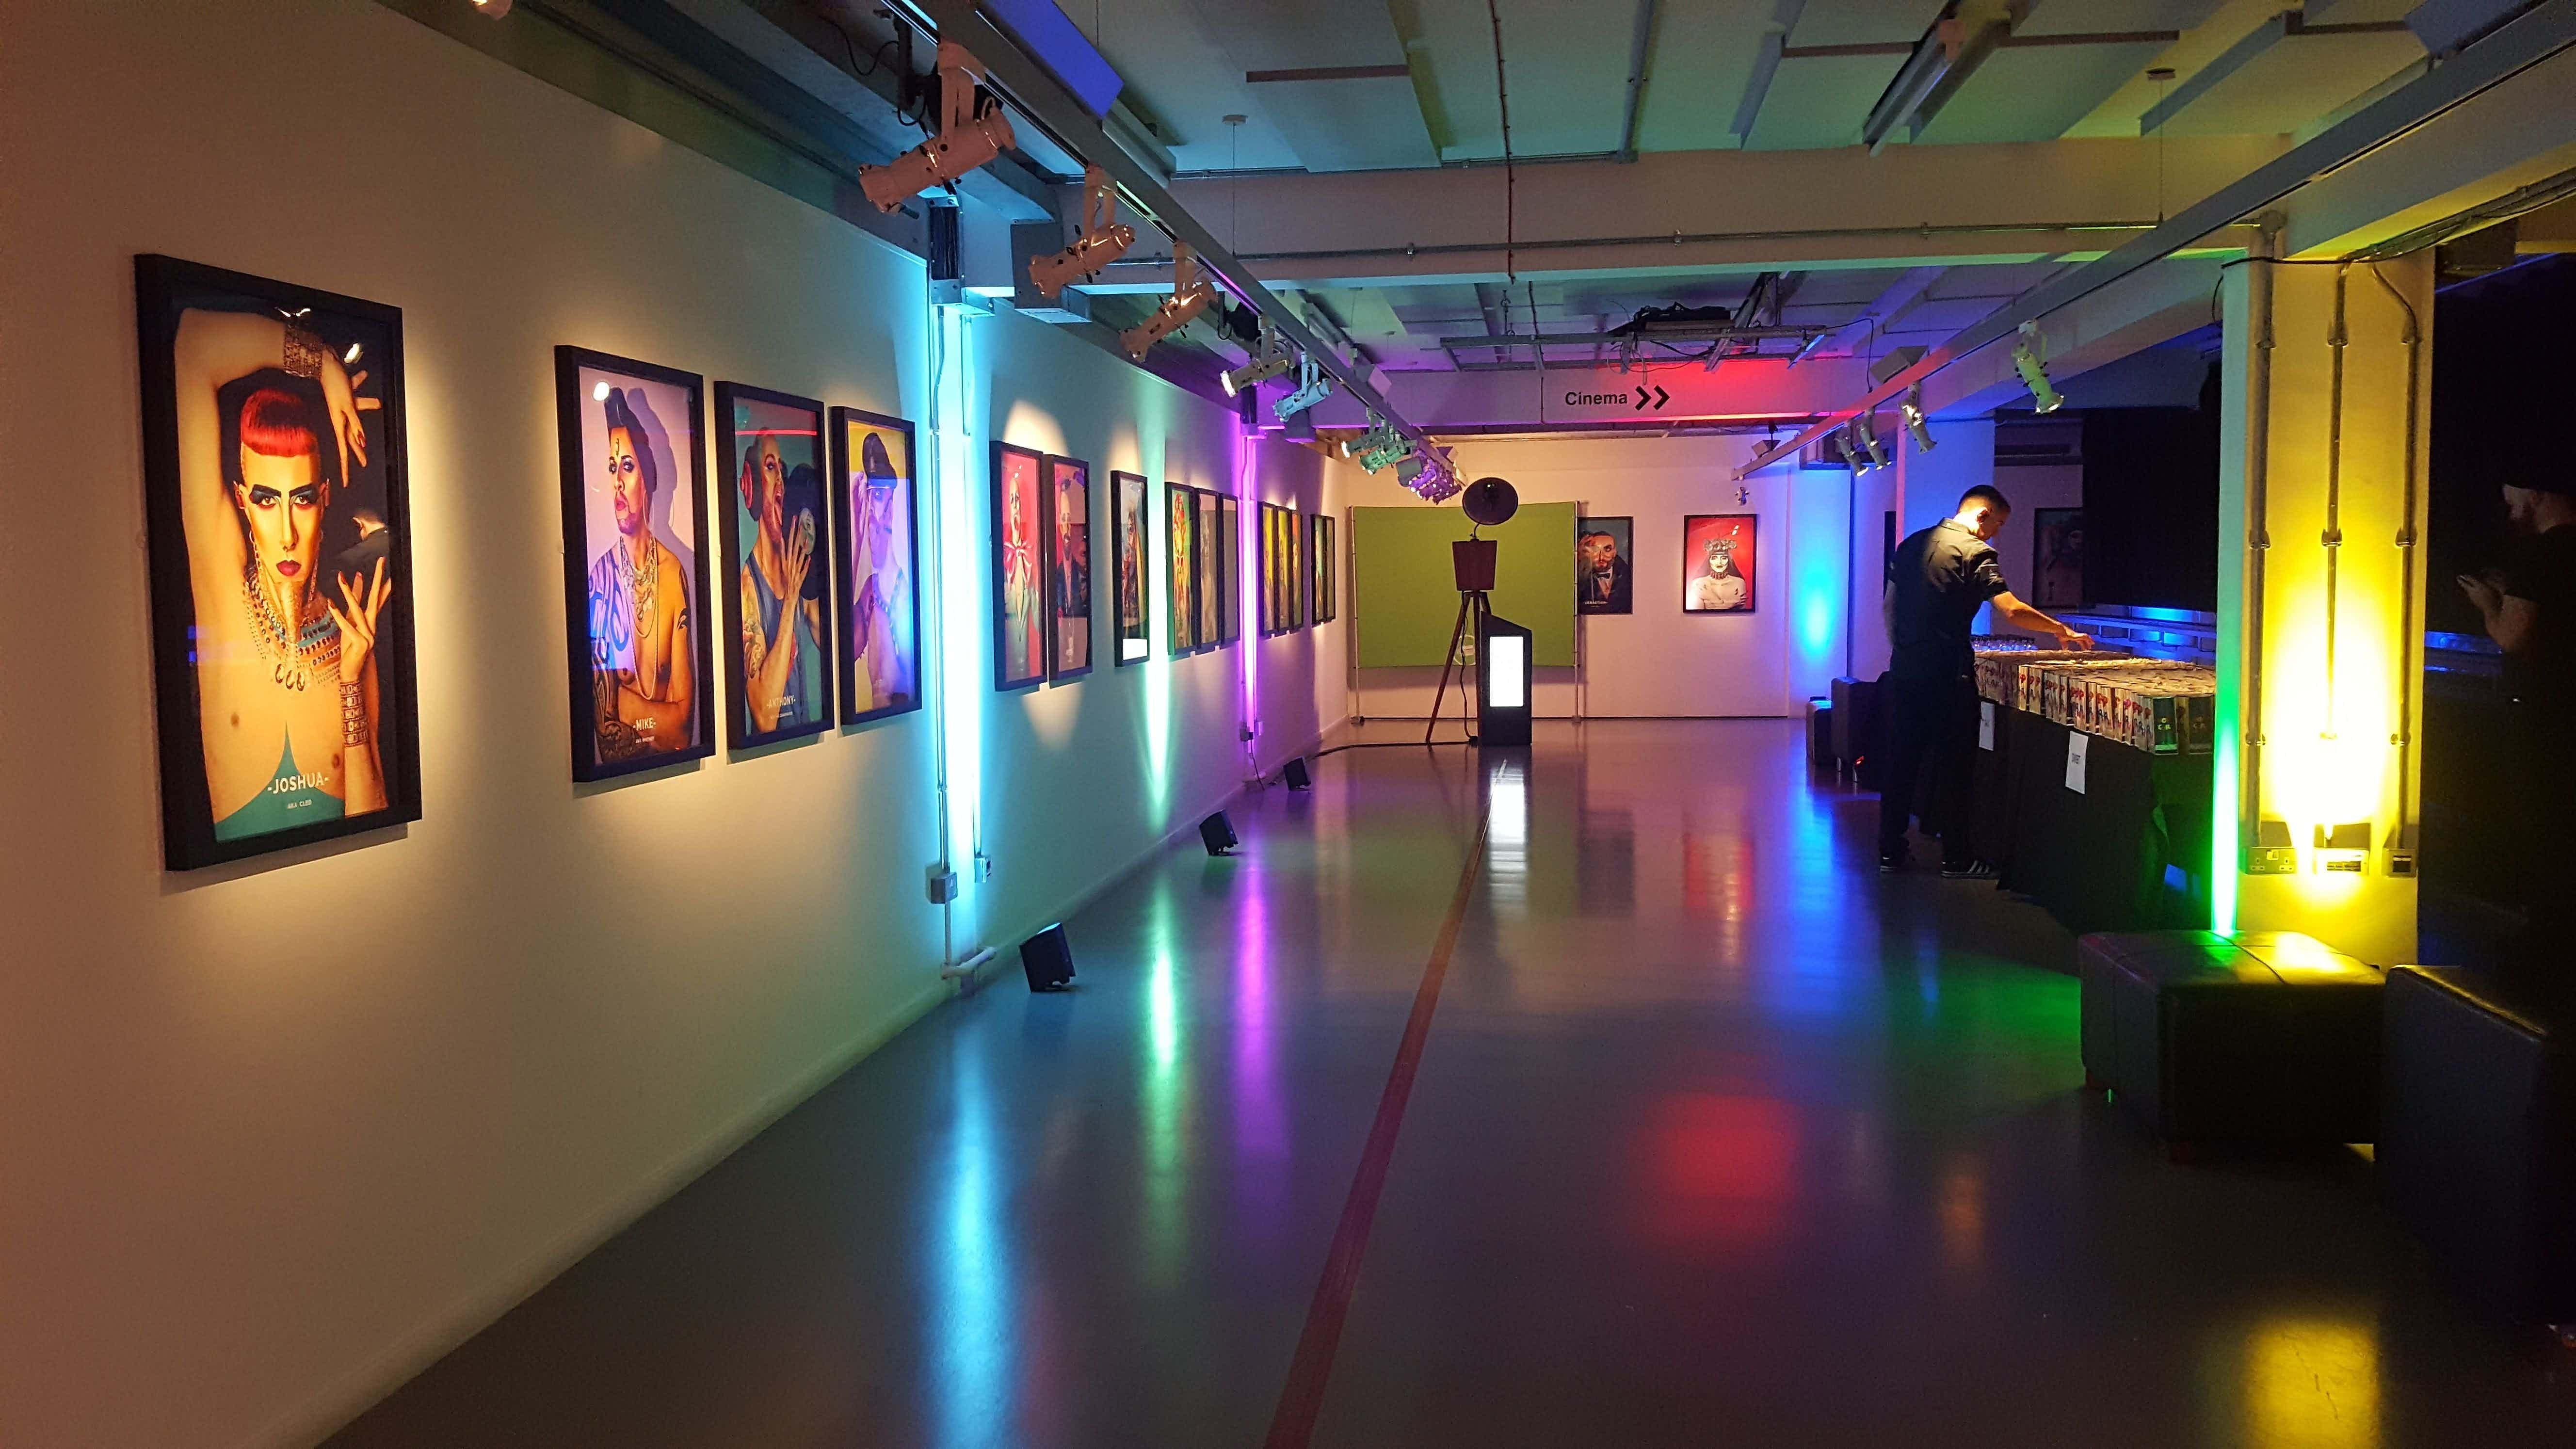 Mezzanine Gallery, Rich Mix